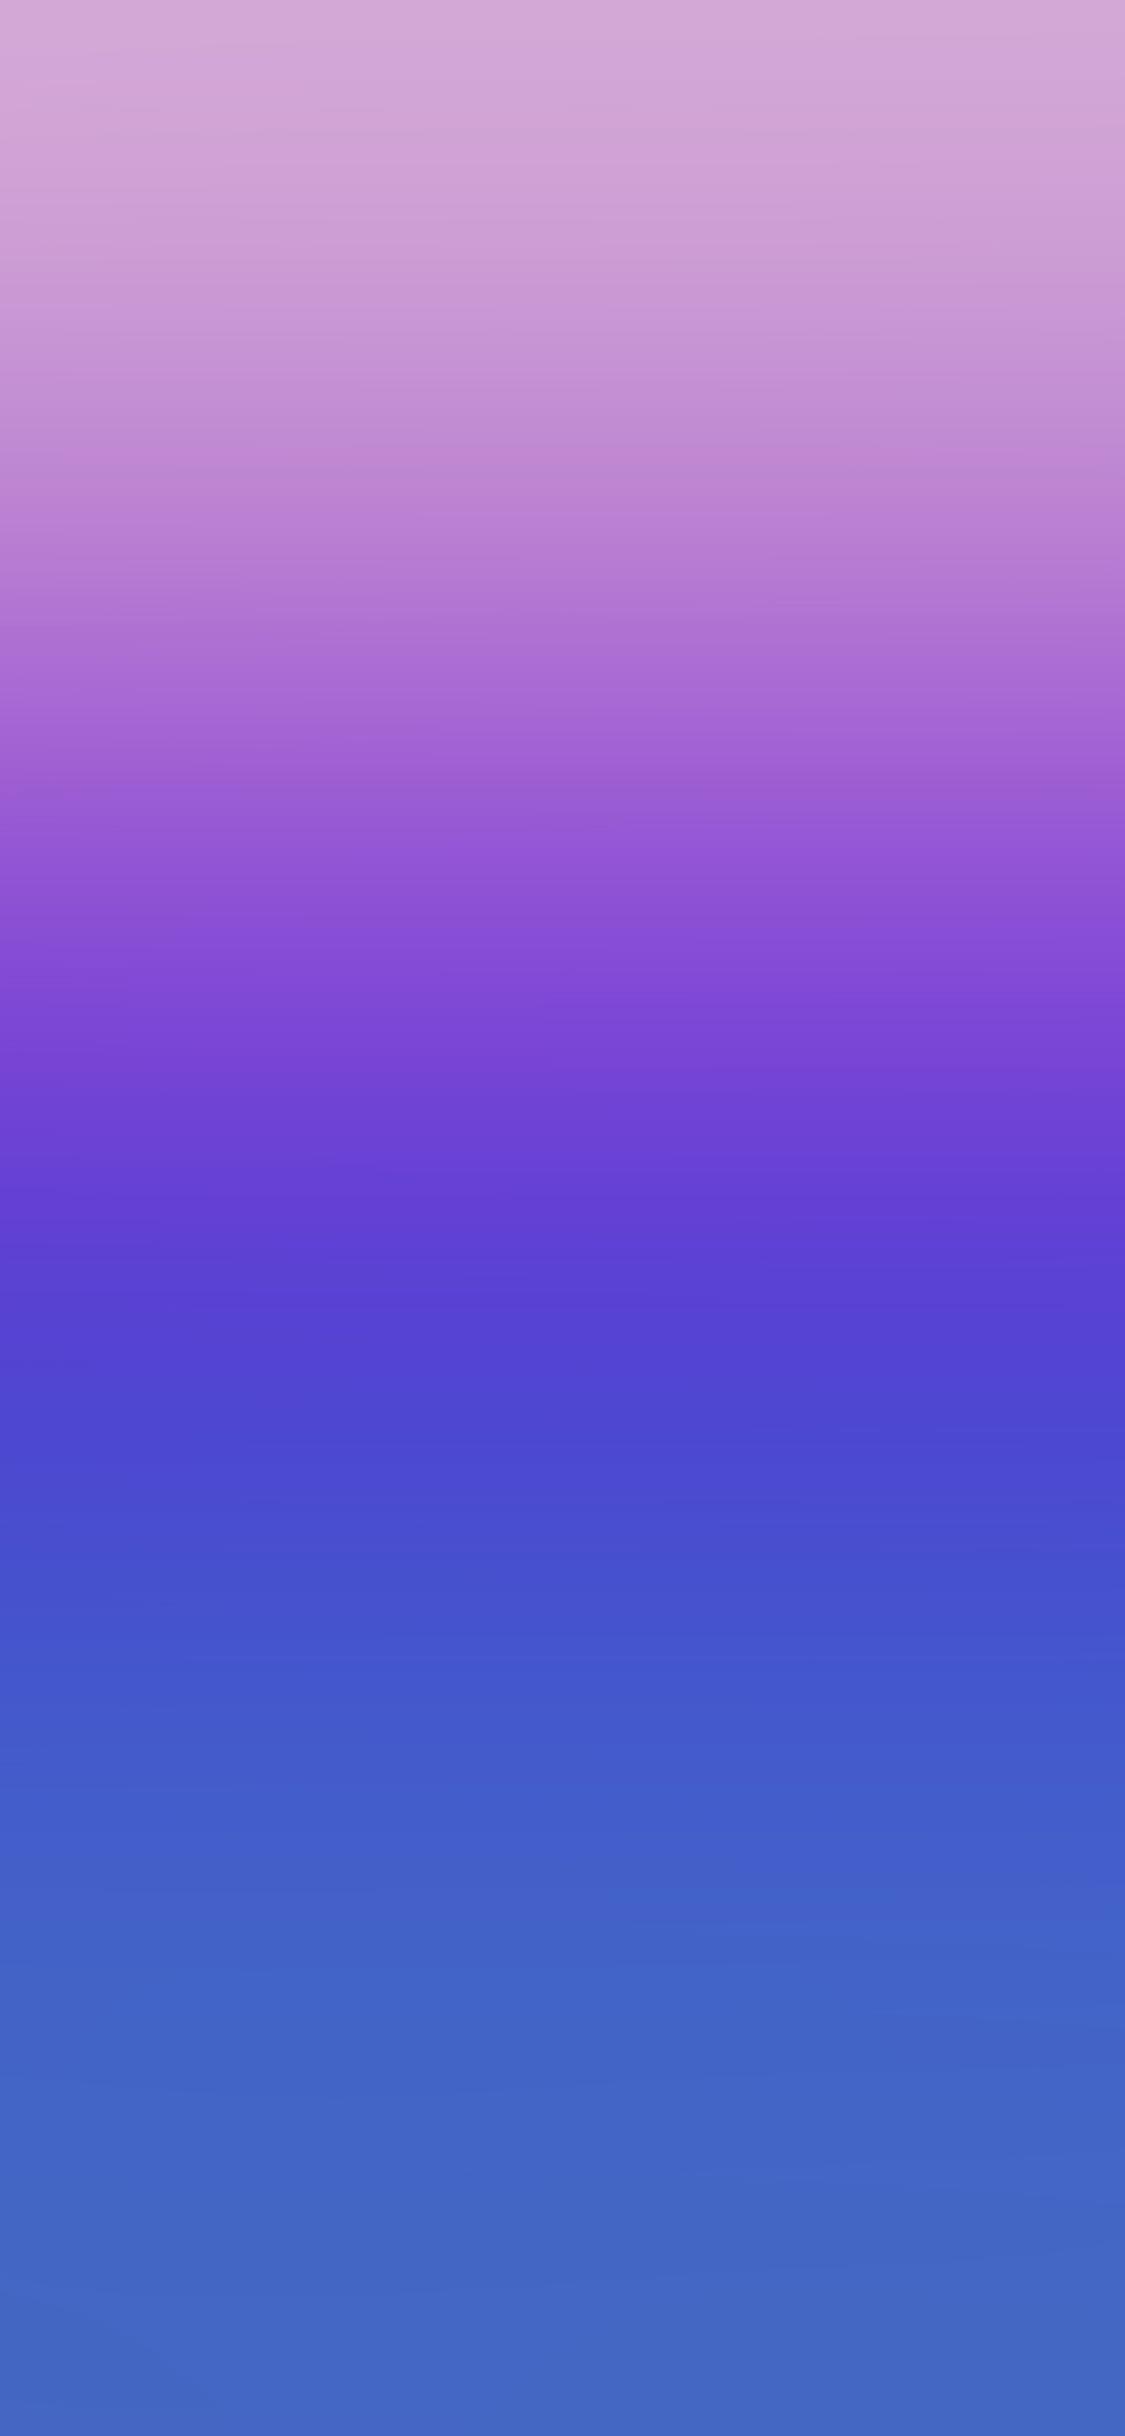 iPhoneXpapers.com-Apple-iPhone-wallpaper-sh38-purple-mania-gradation-blur